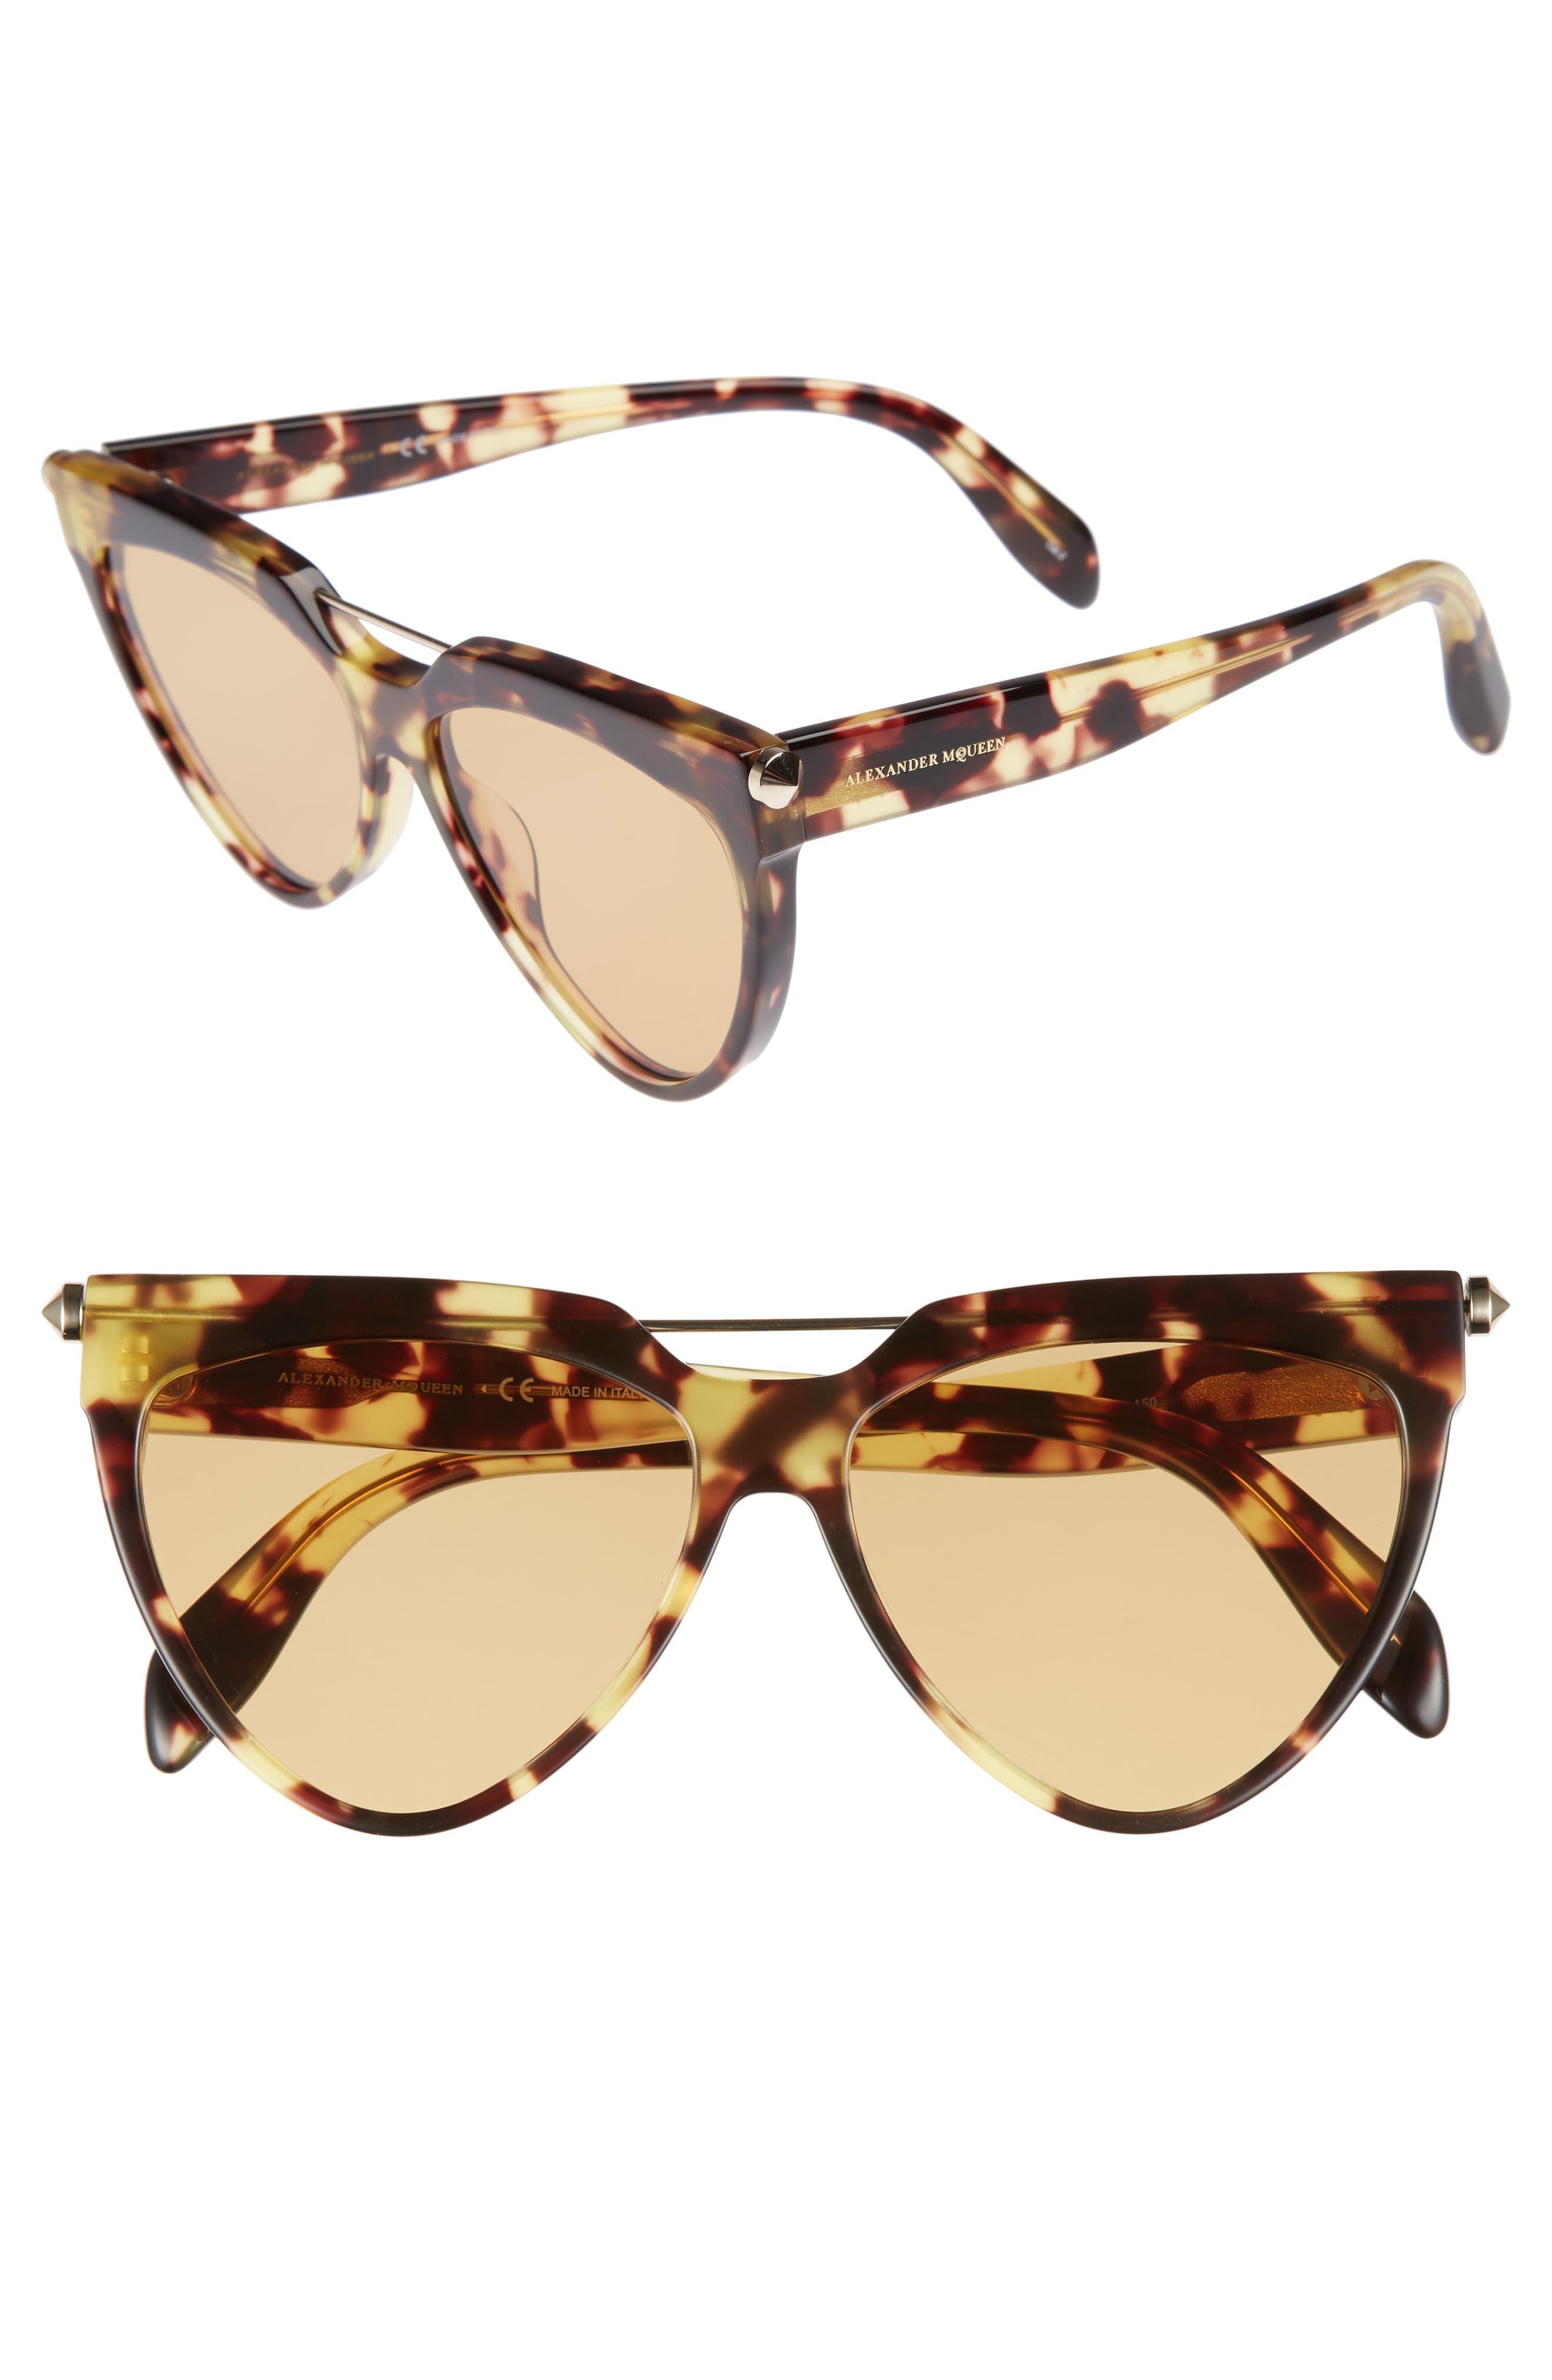 Main Image - Alexander McQueen 58mm Cat Eye Sunglasses